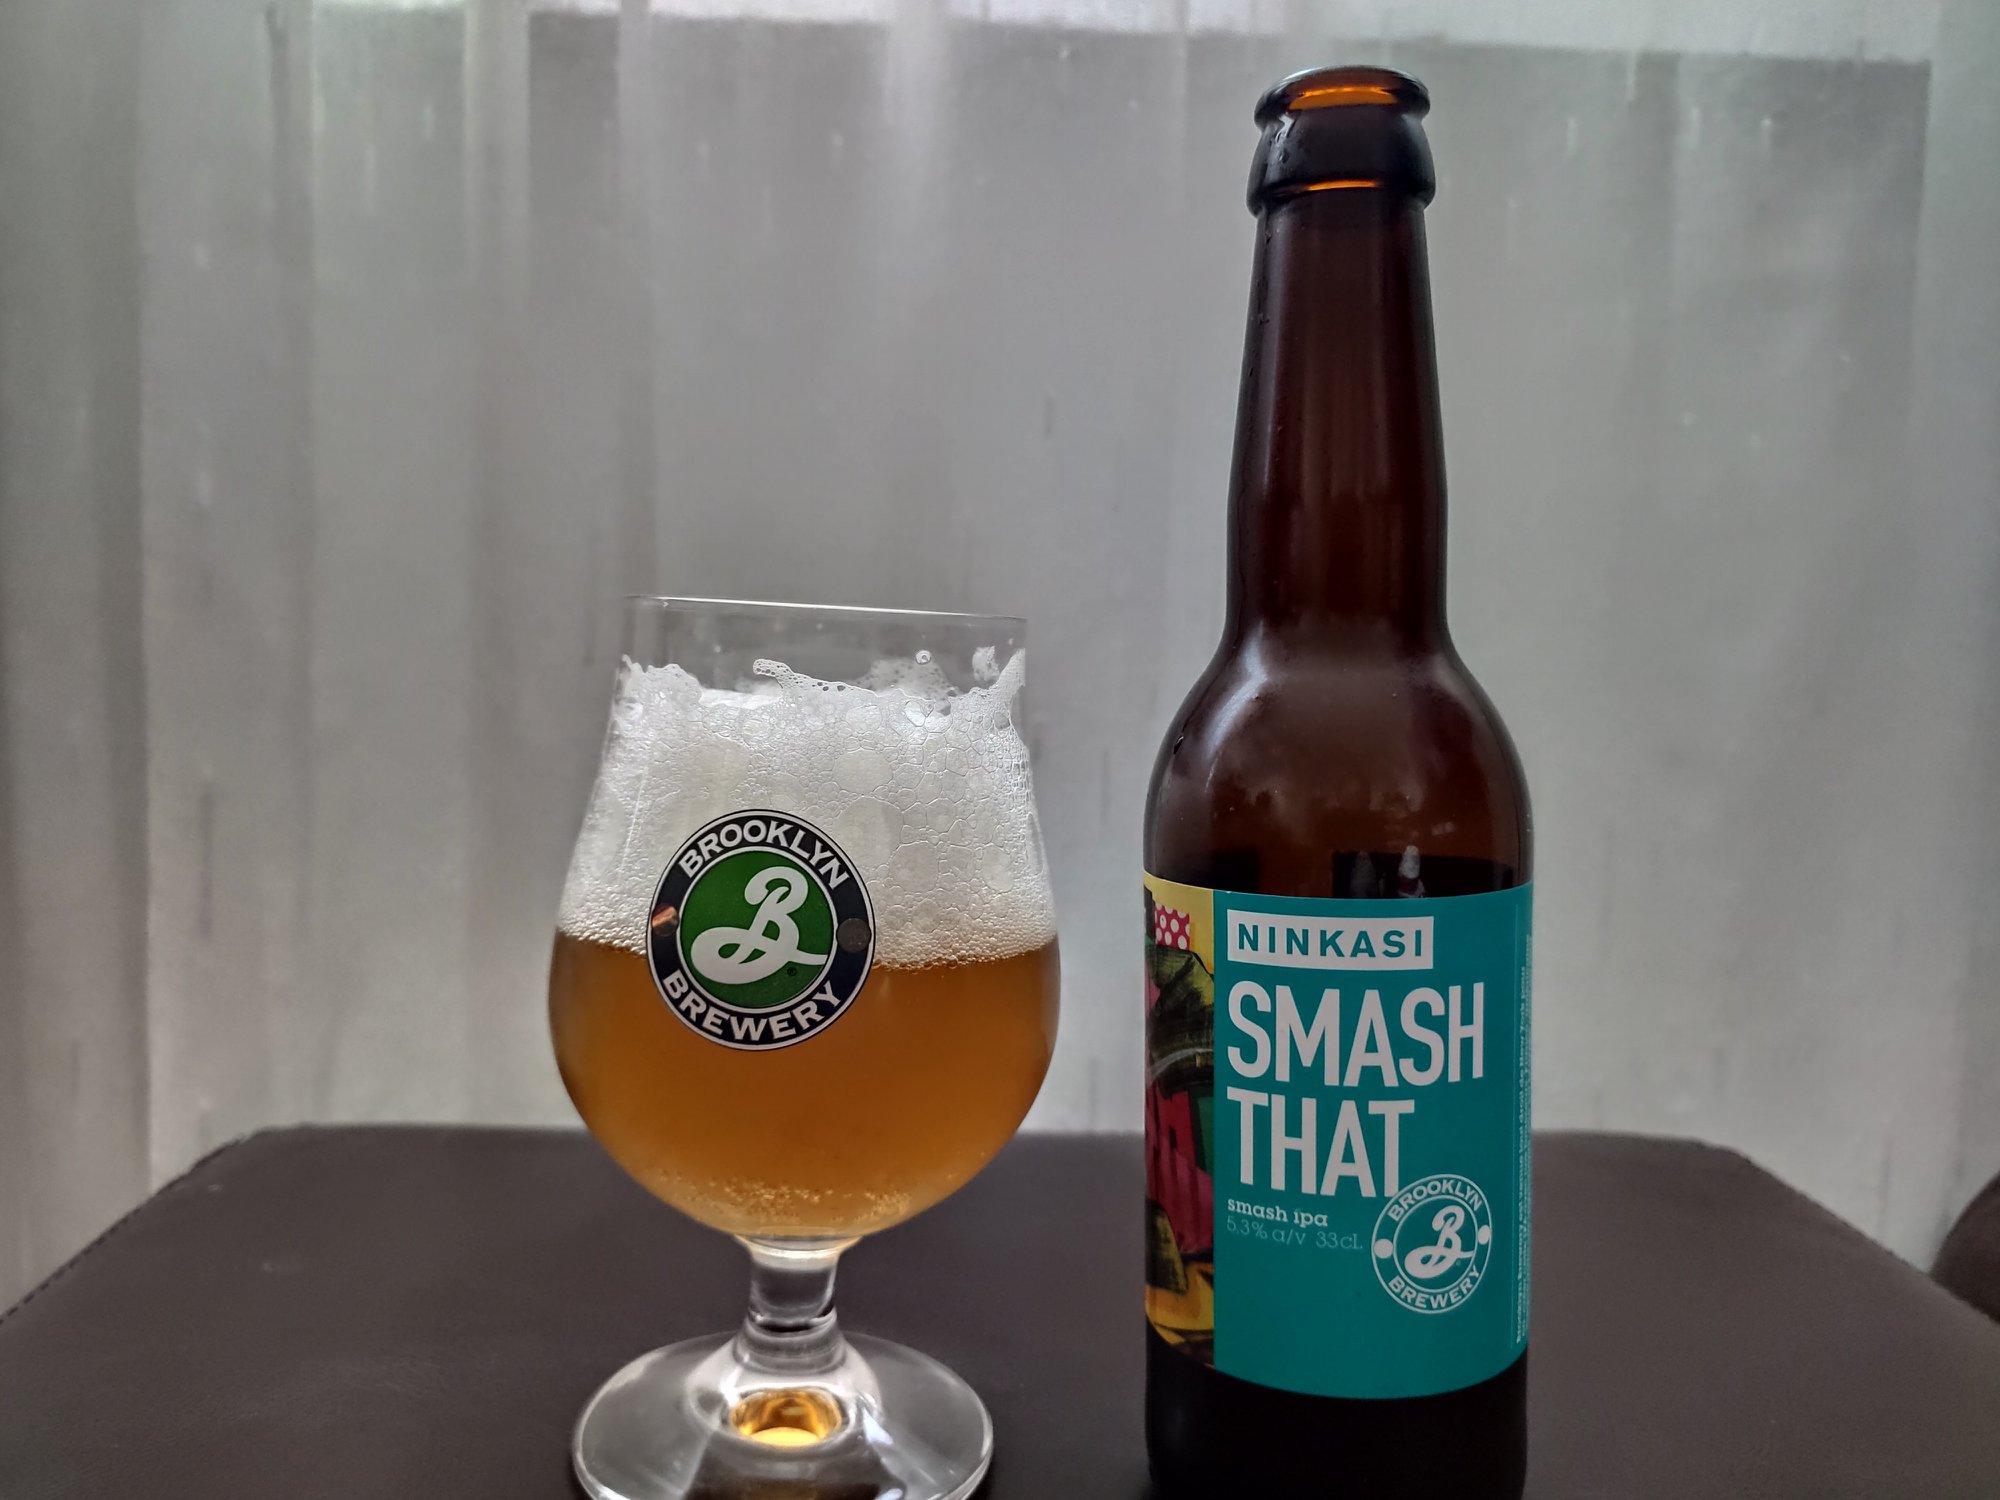 Smash That - Brooklyn Brewery - Ninkasi